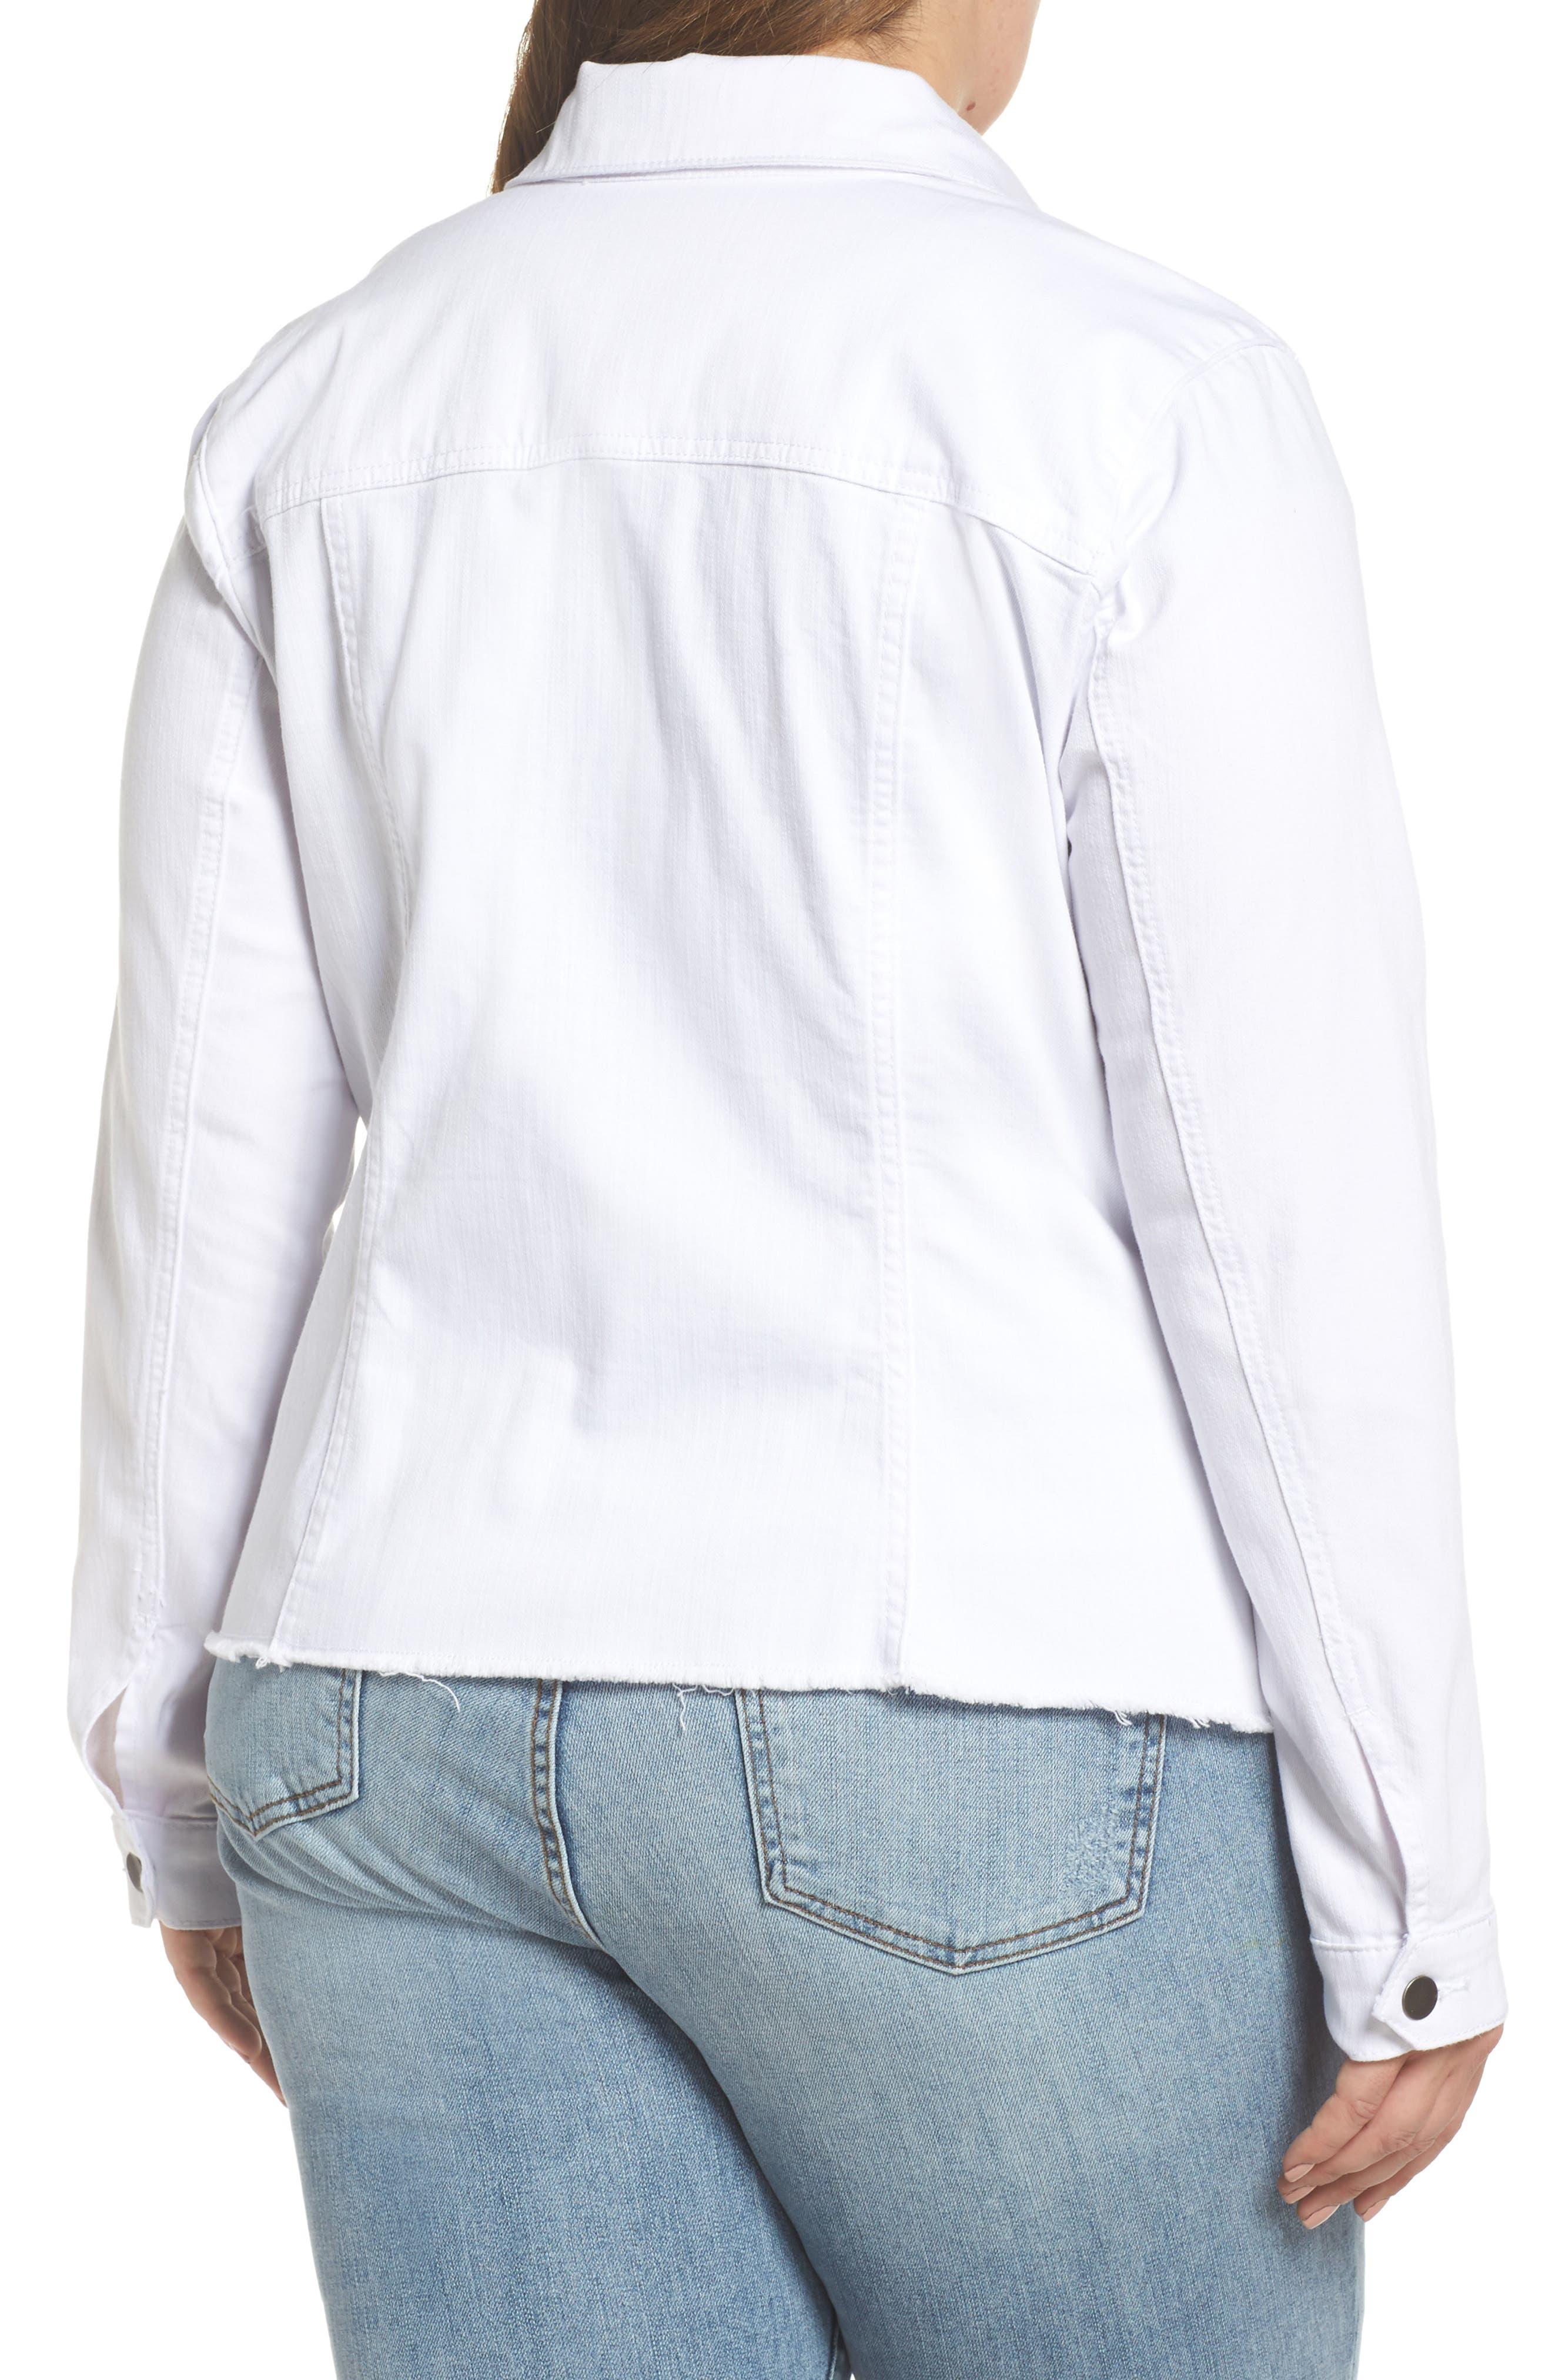 Kara Denim Jacket,                             Alternate thumbnail 2, color,                             OPTIC WHITE